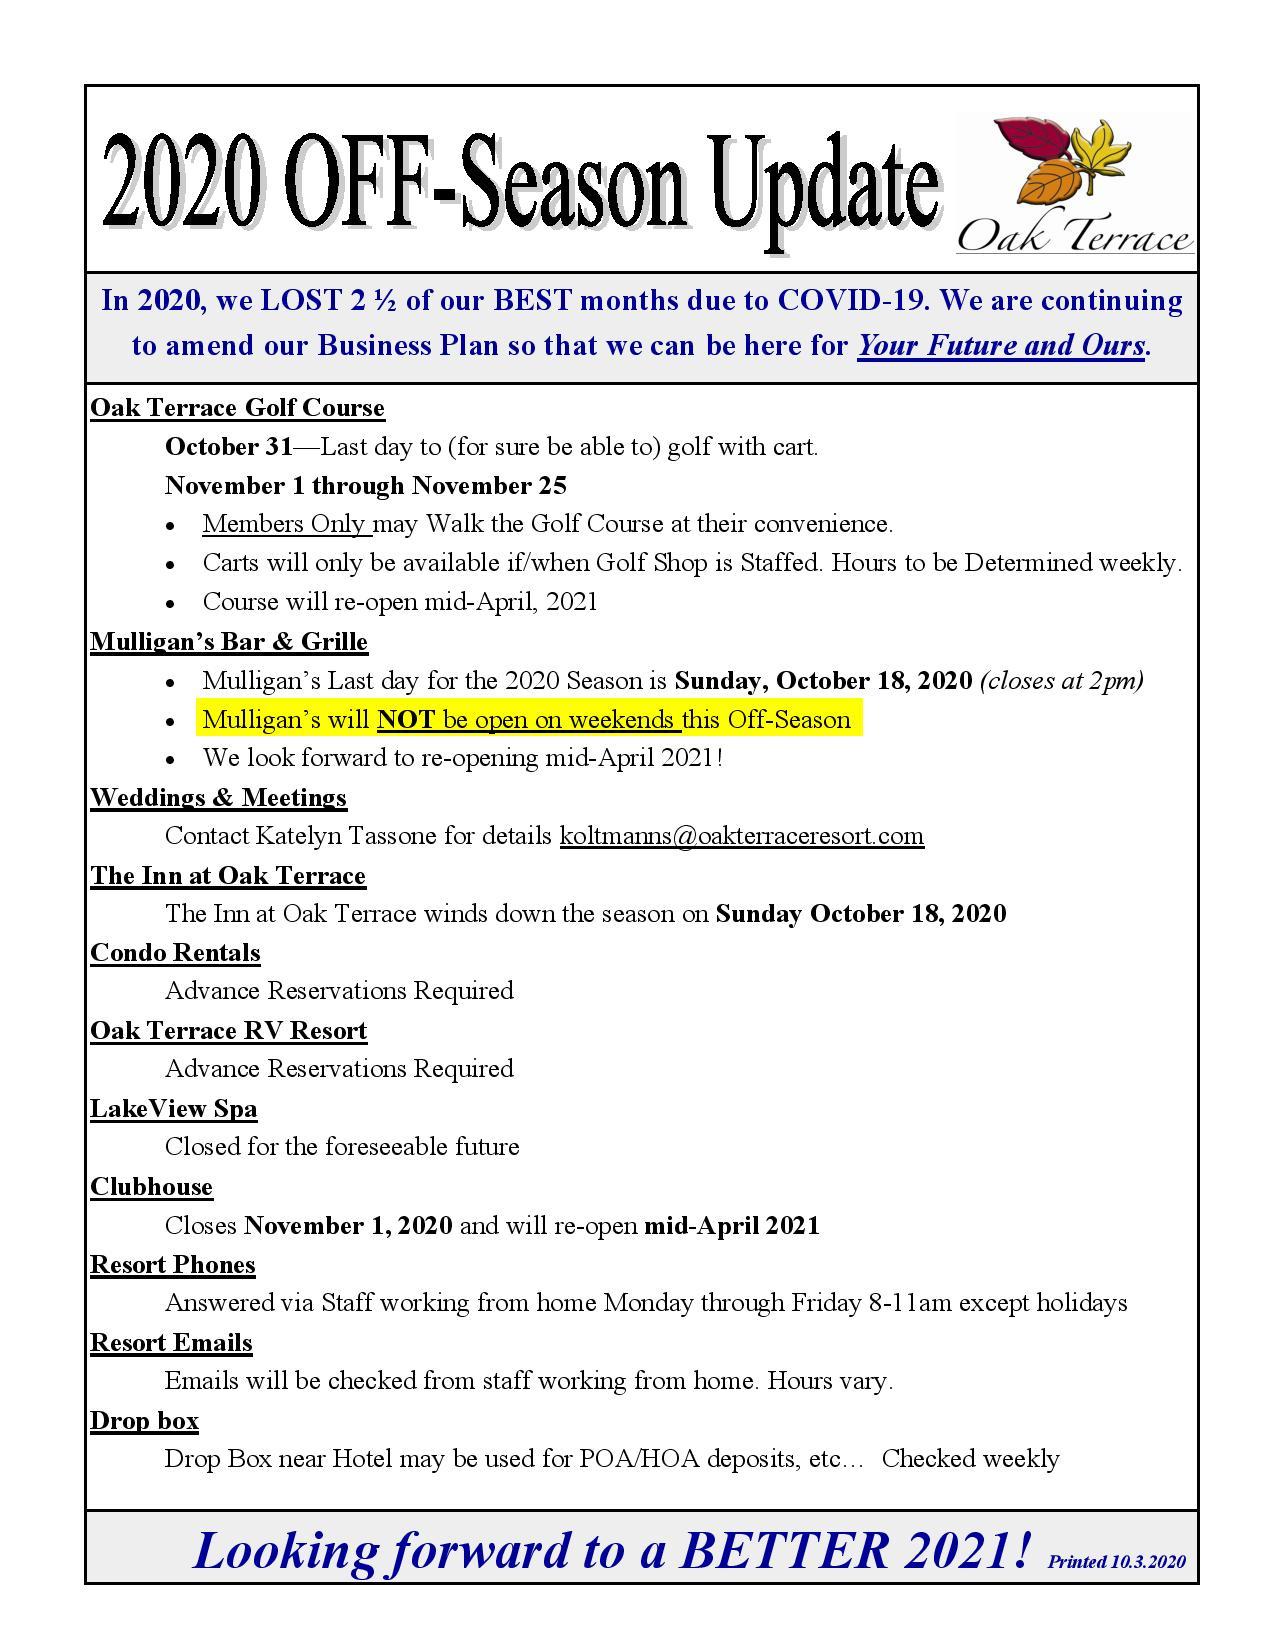 2020 OFF-Season Update-page-001